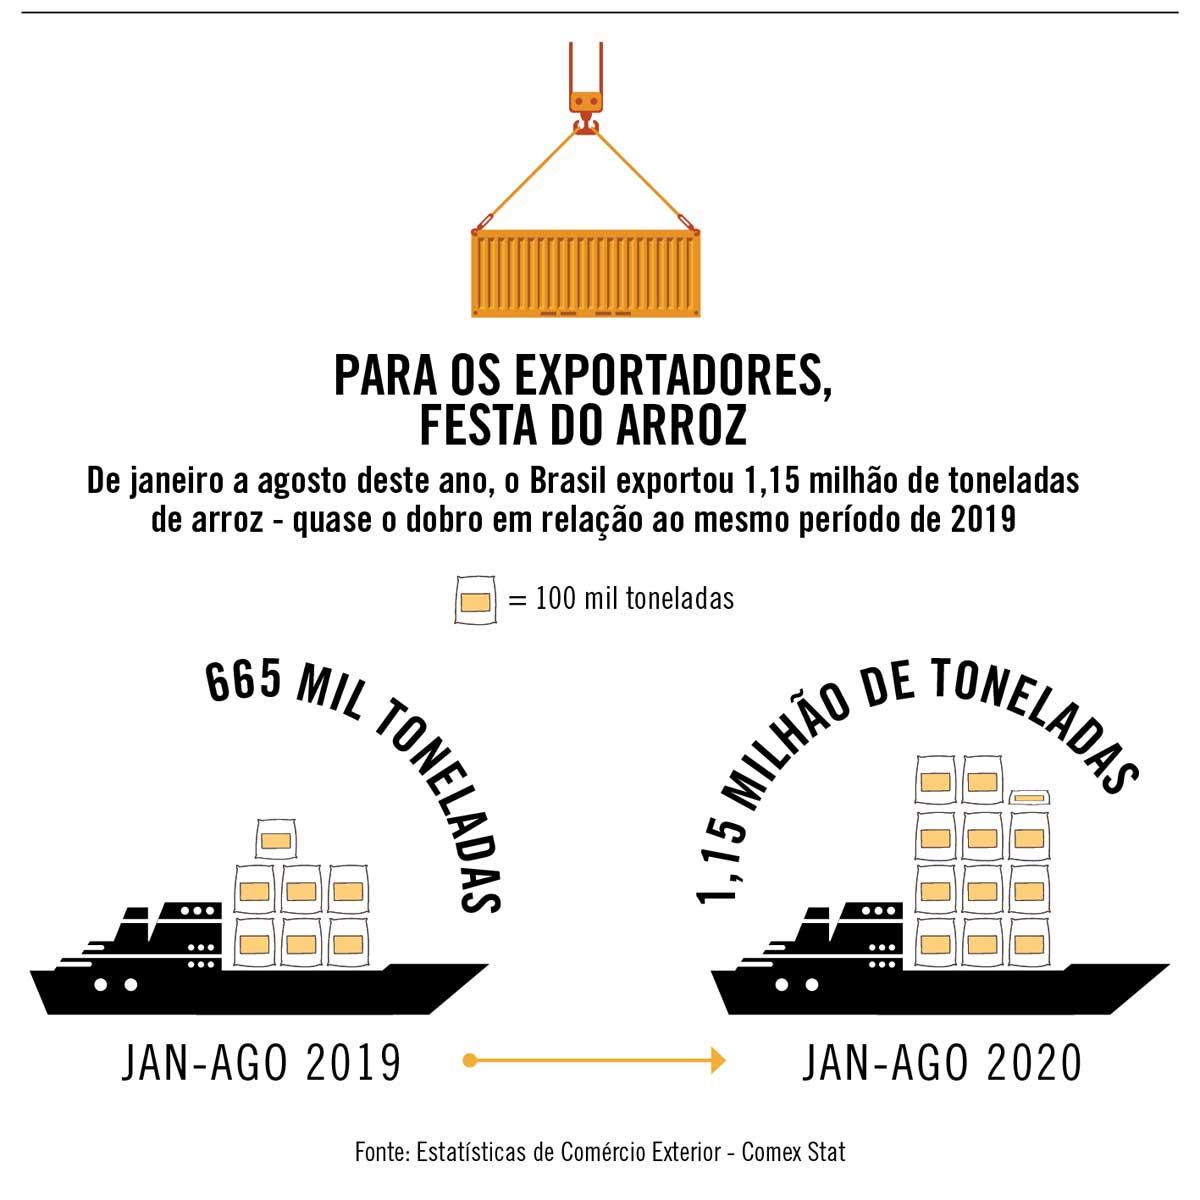 Para os exportadores, festa do arroz